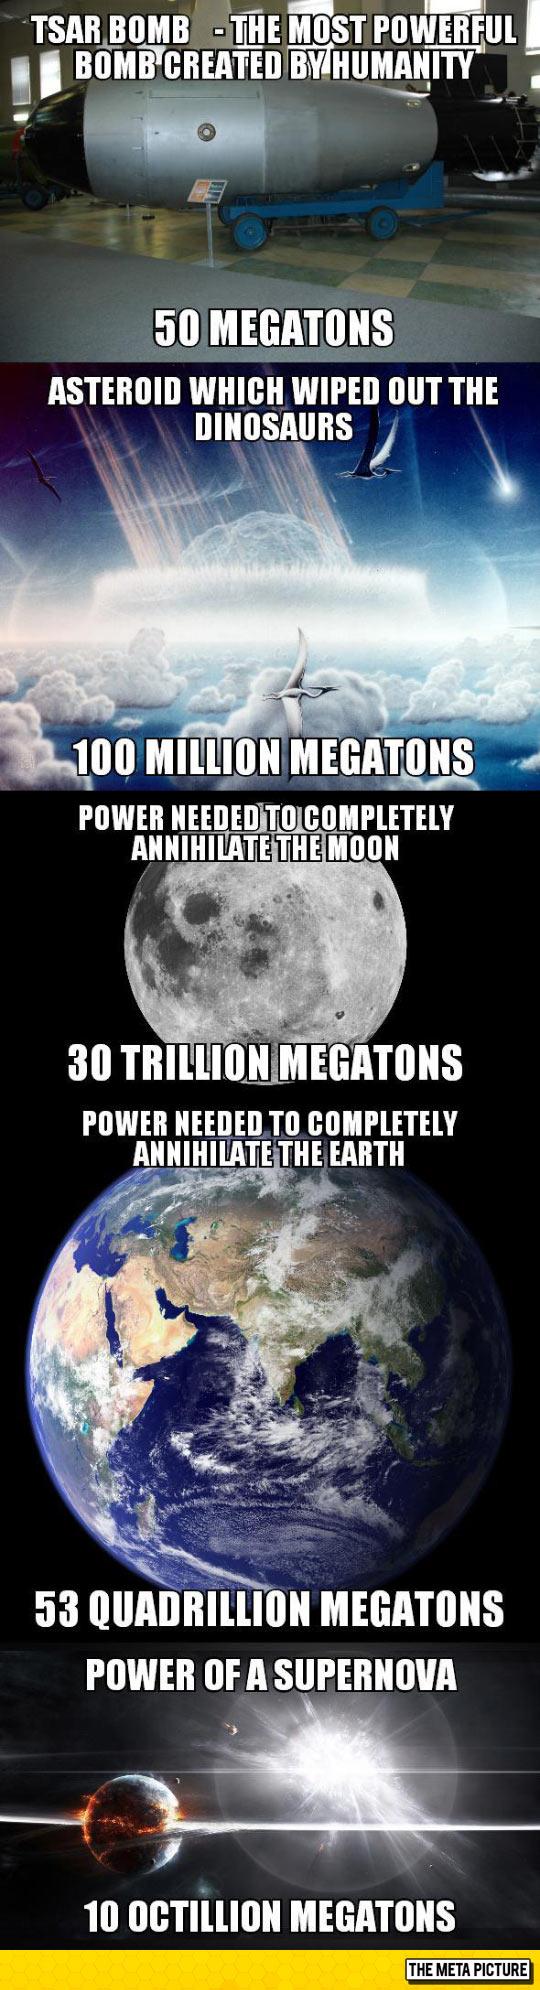 megatons-humanity-bomb-asteroid